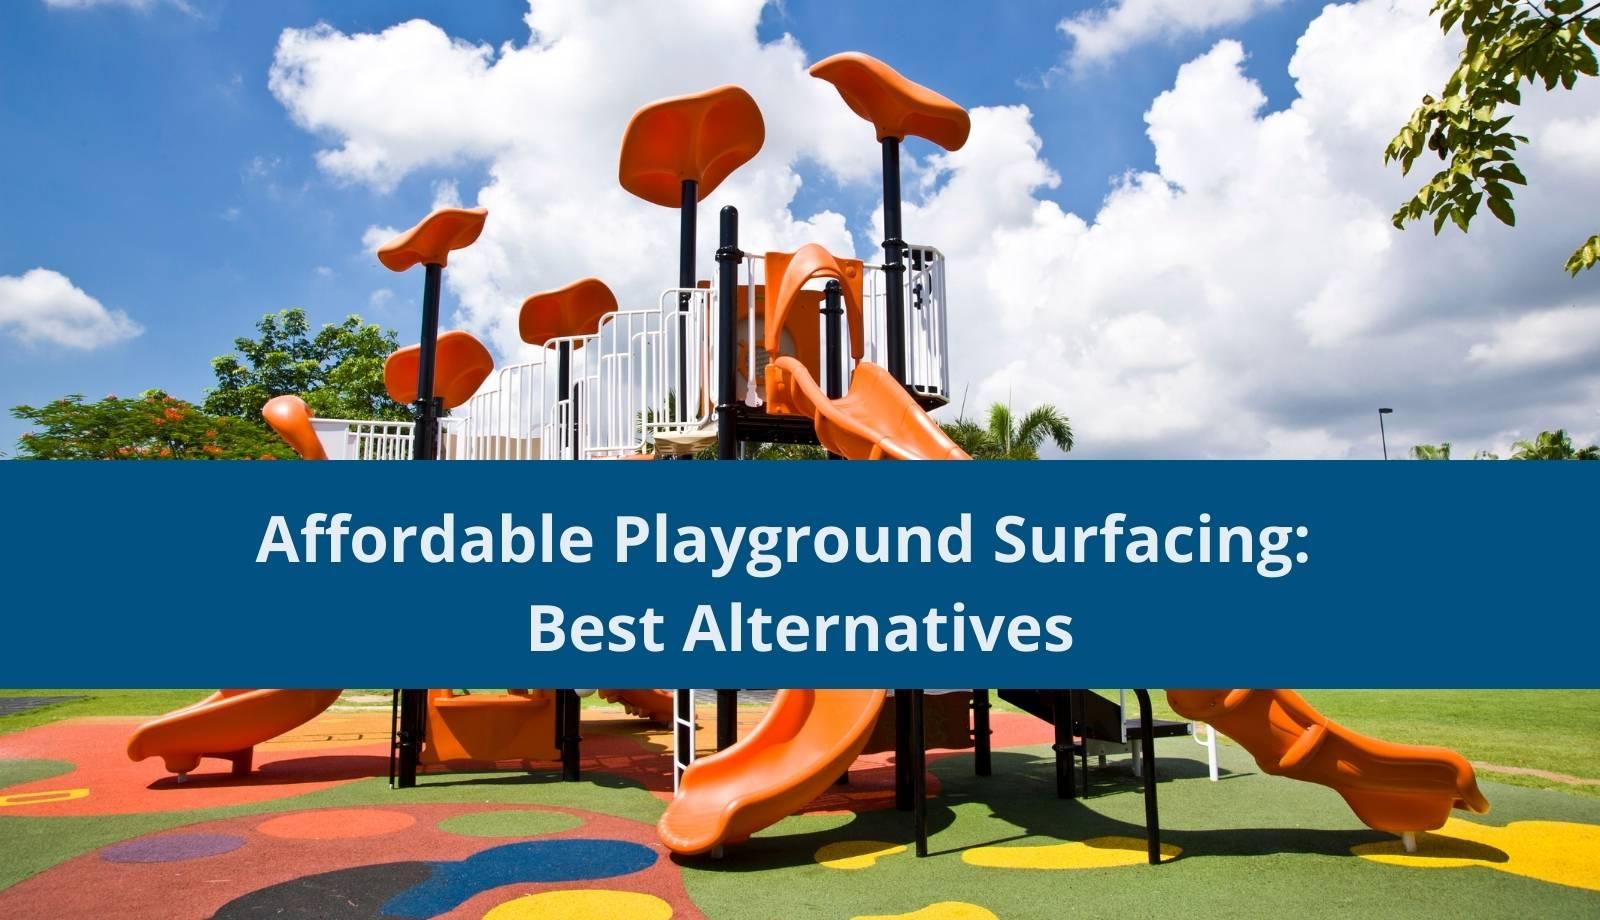 Affordable Playground Surfacing Best Alternatives